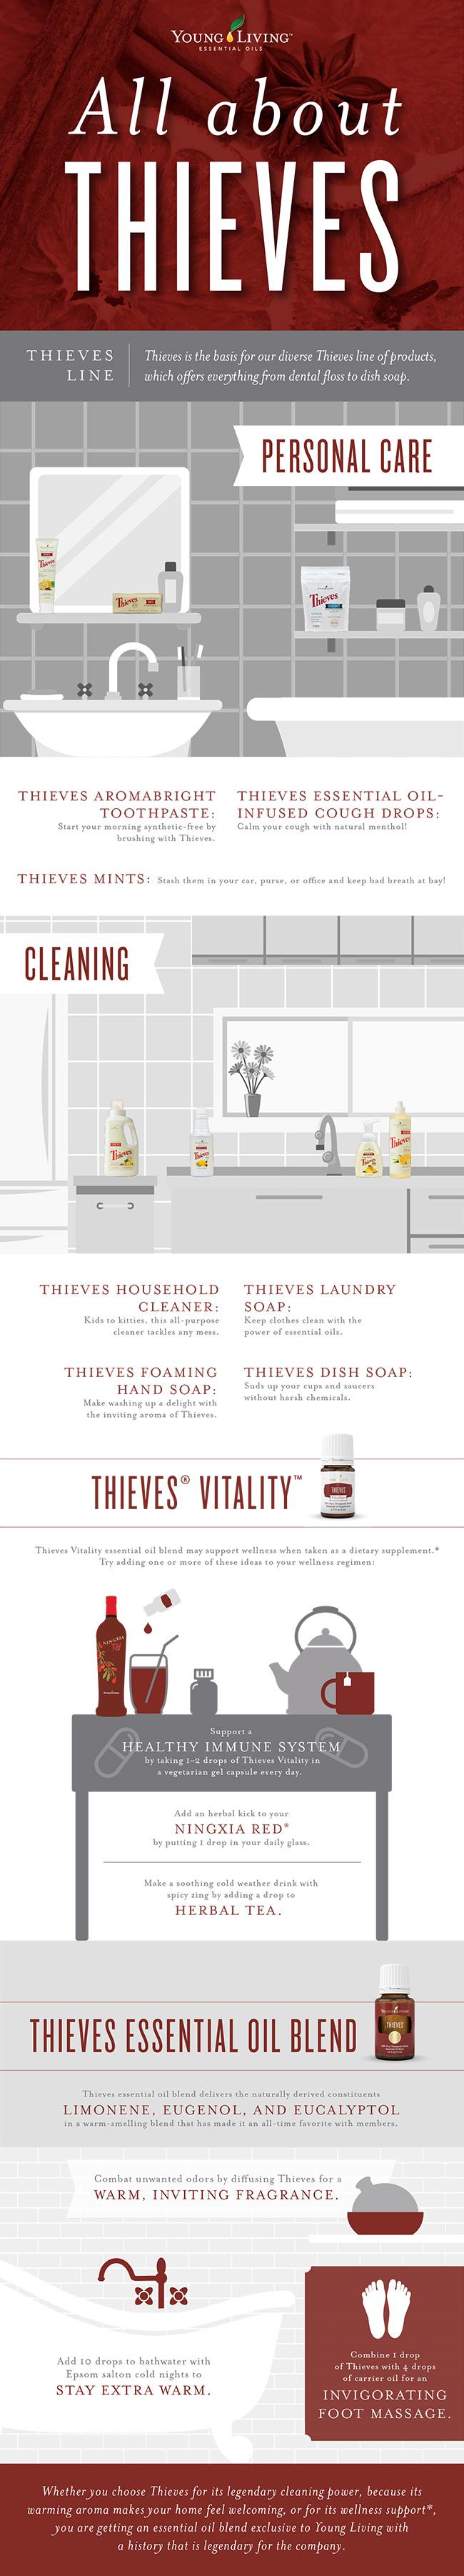 Blog Alles über Thieves Young Living AROMAREICH Infographik Englisch